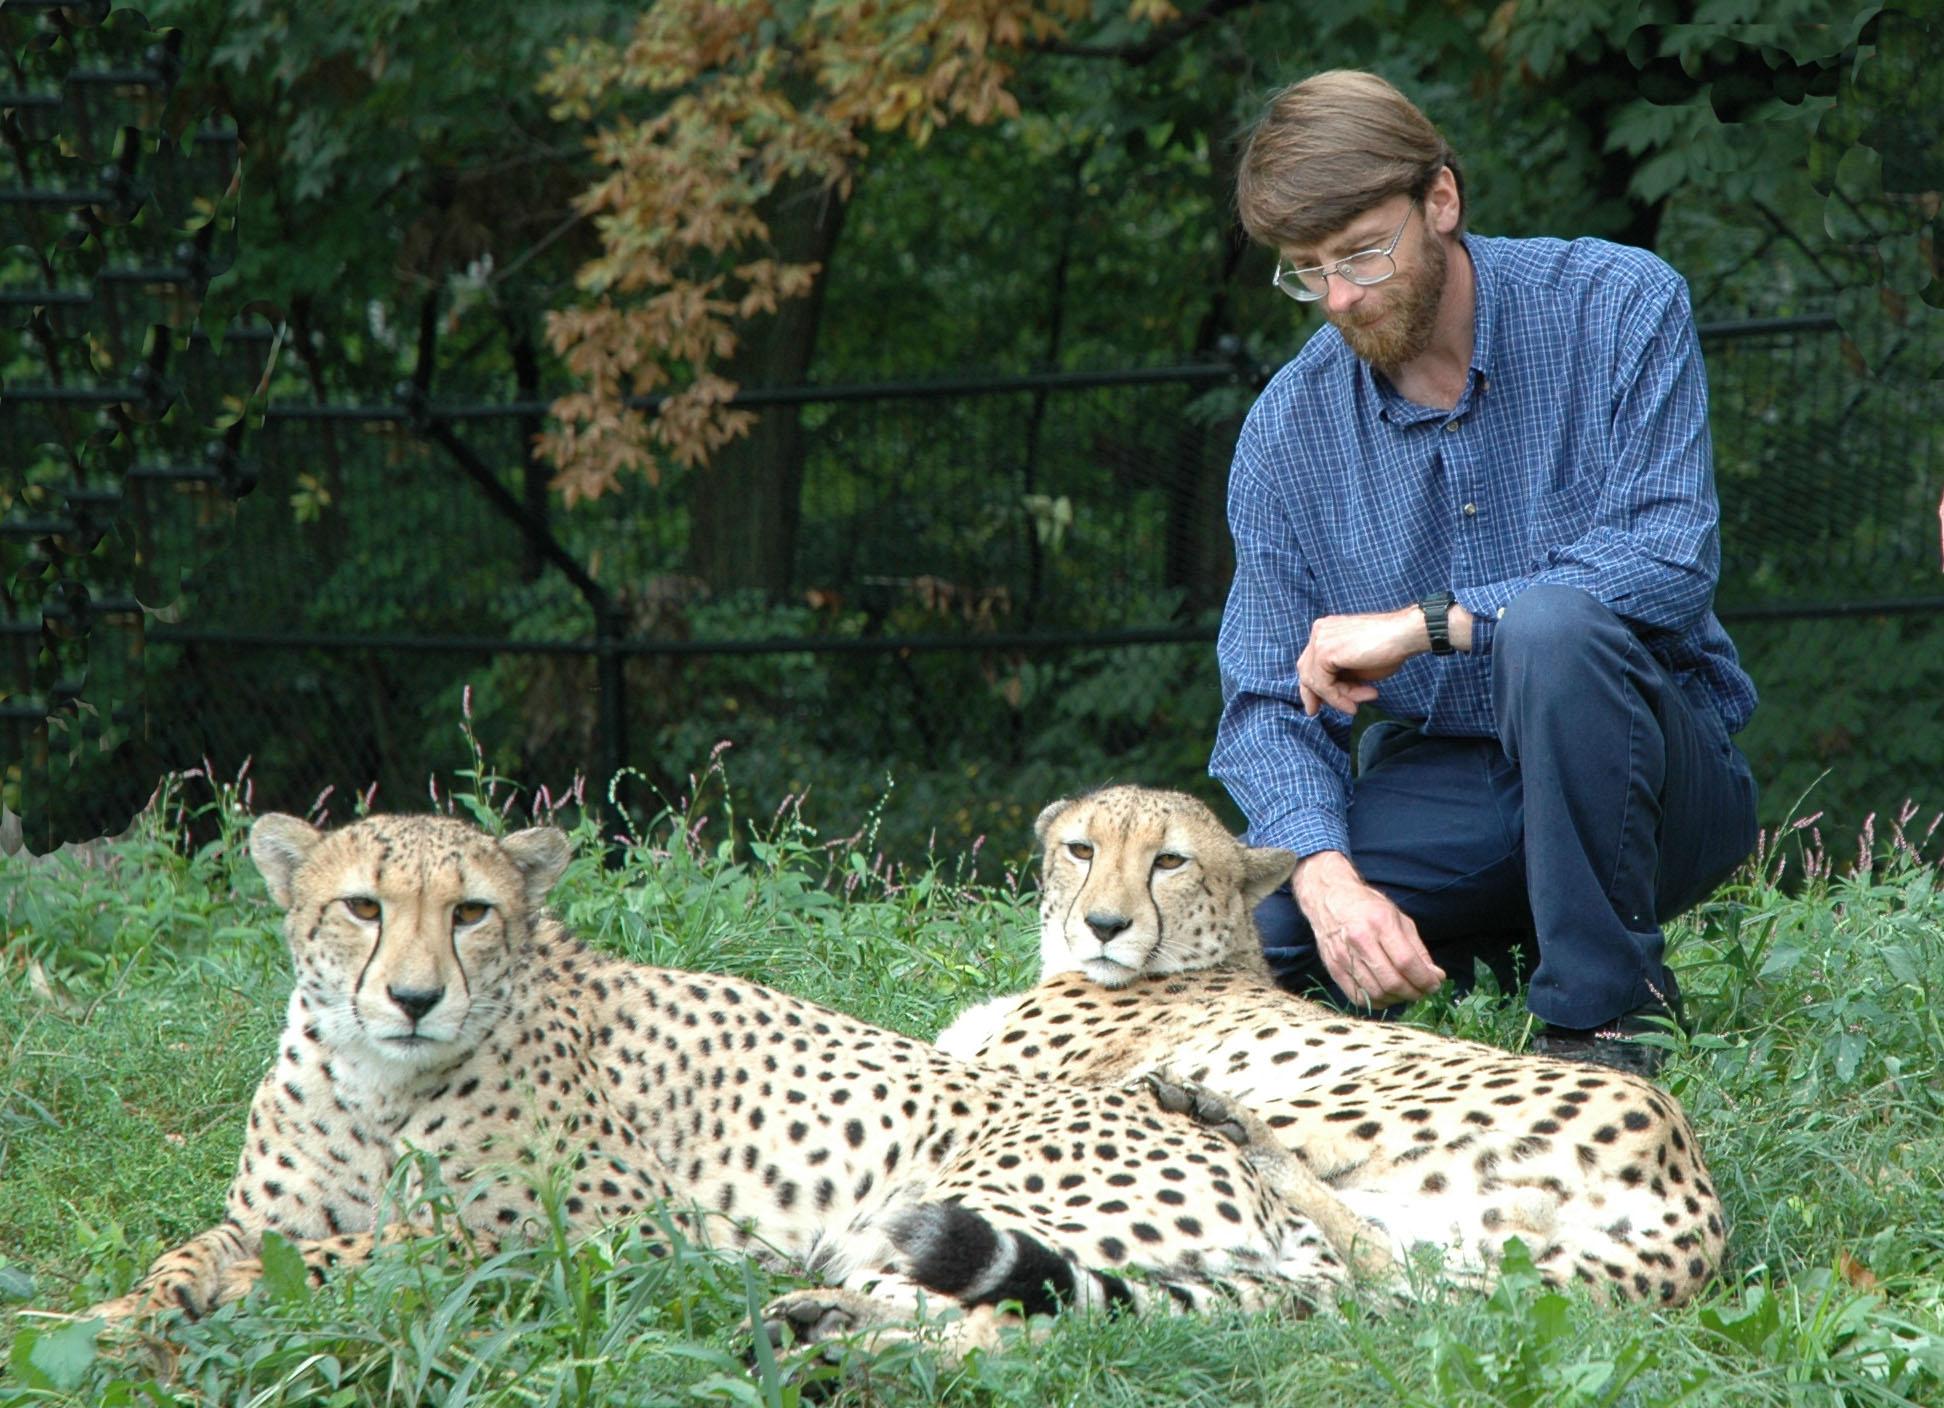 Dave-and-Cheetahs